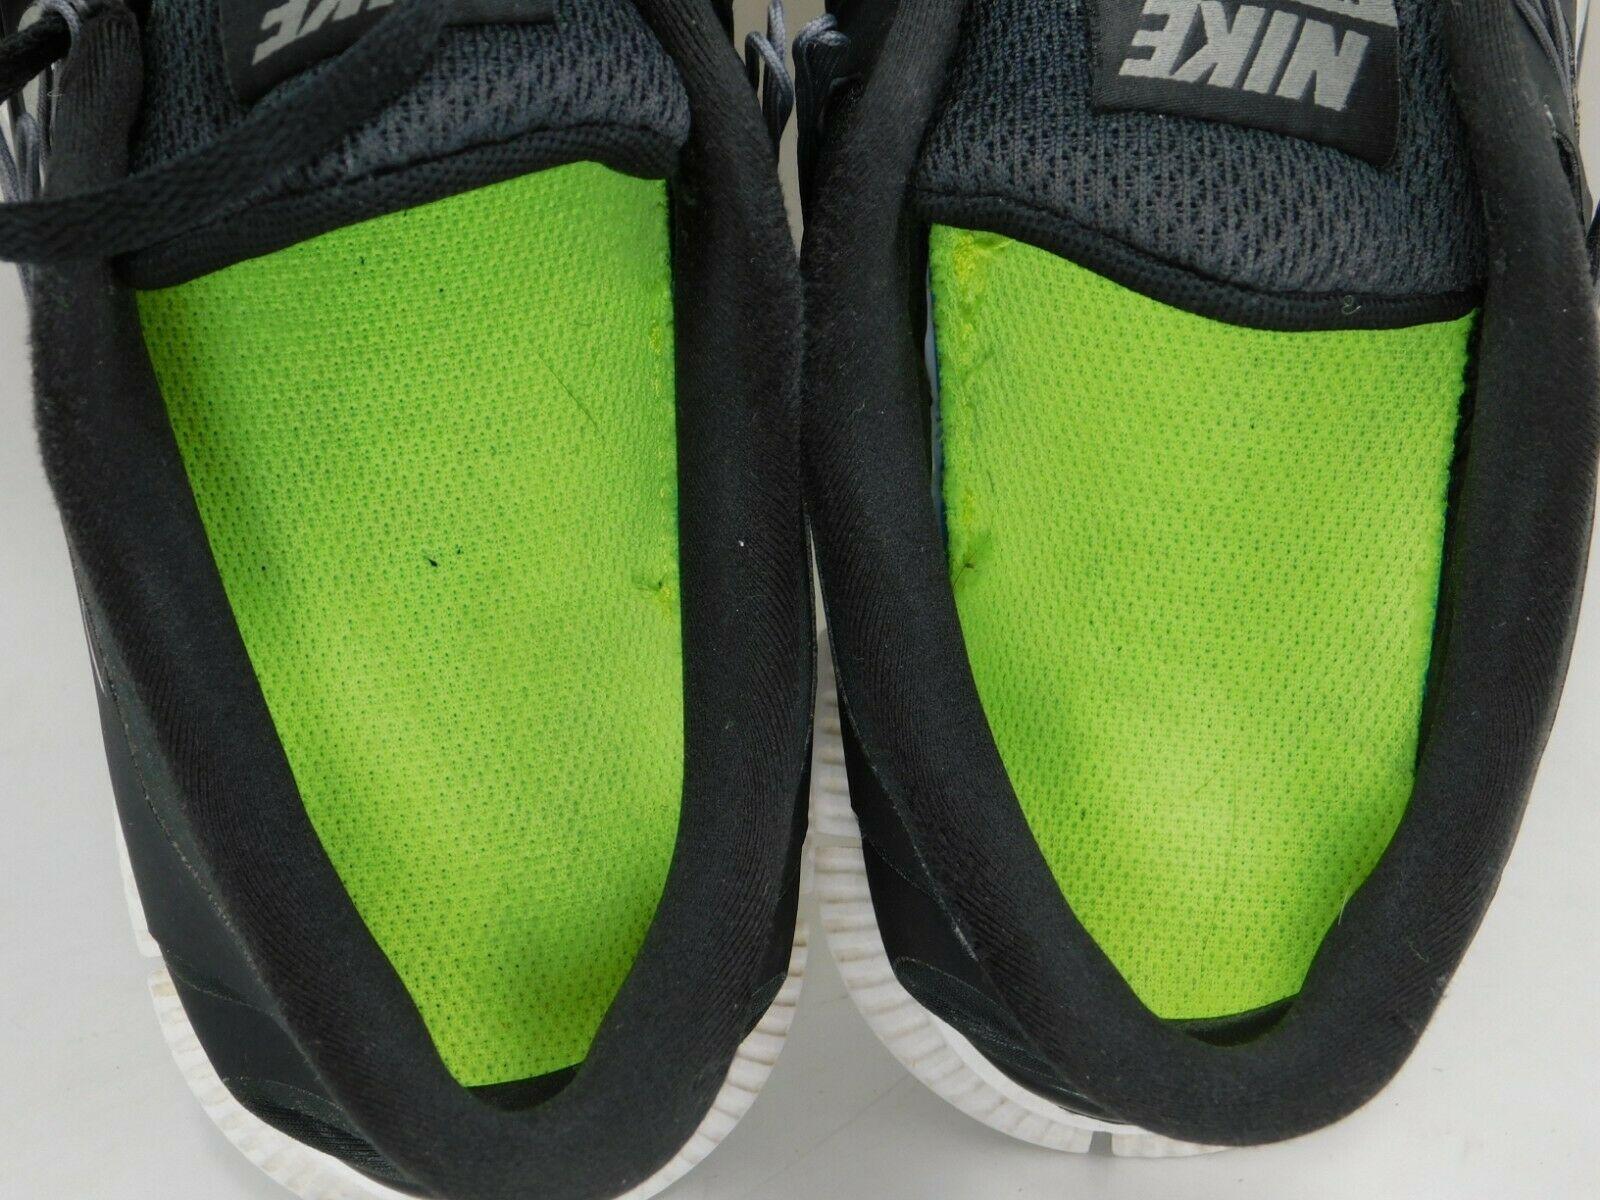 Nike Free 5.0+ Size US 9.5 M (D) EU 41 Women's Running Shoes Black 580591-002 image 10